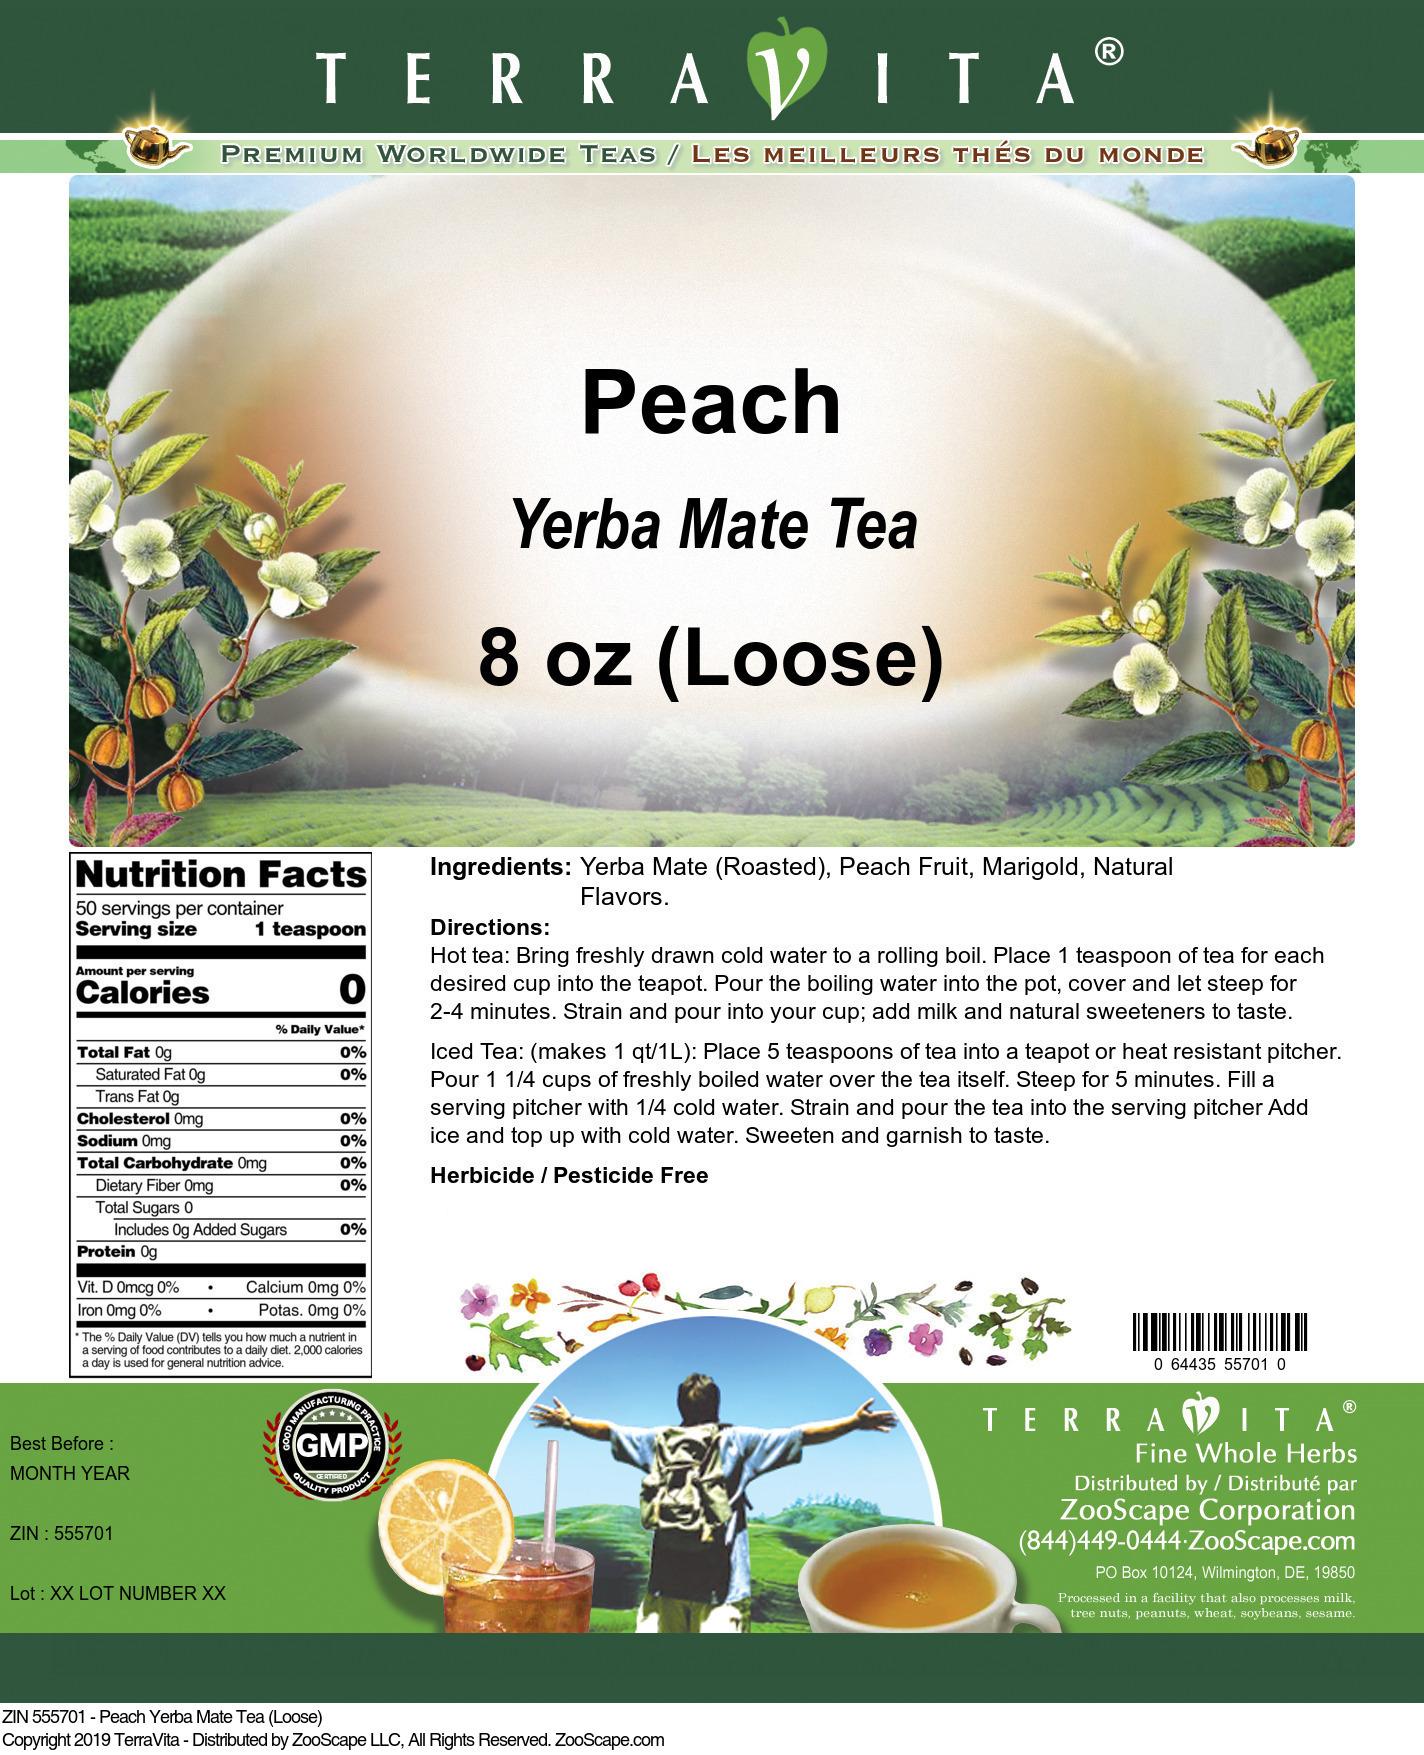 Peach Yerba Mate